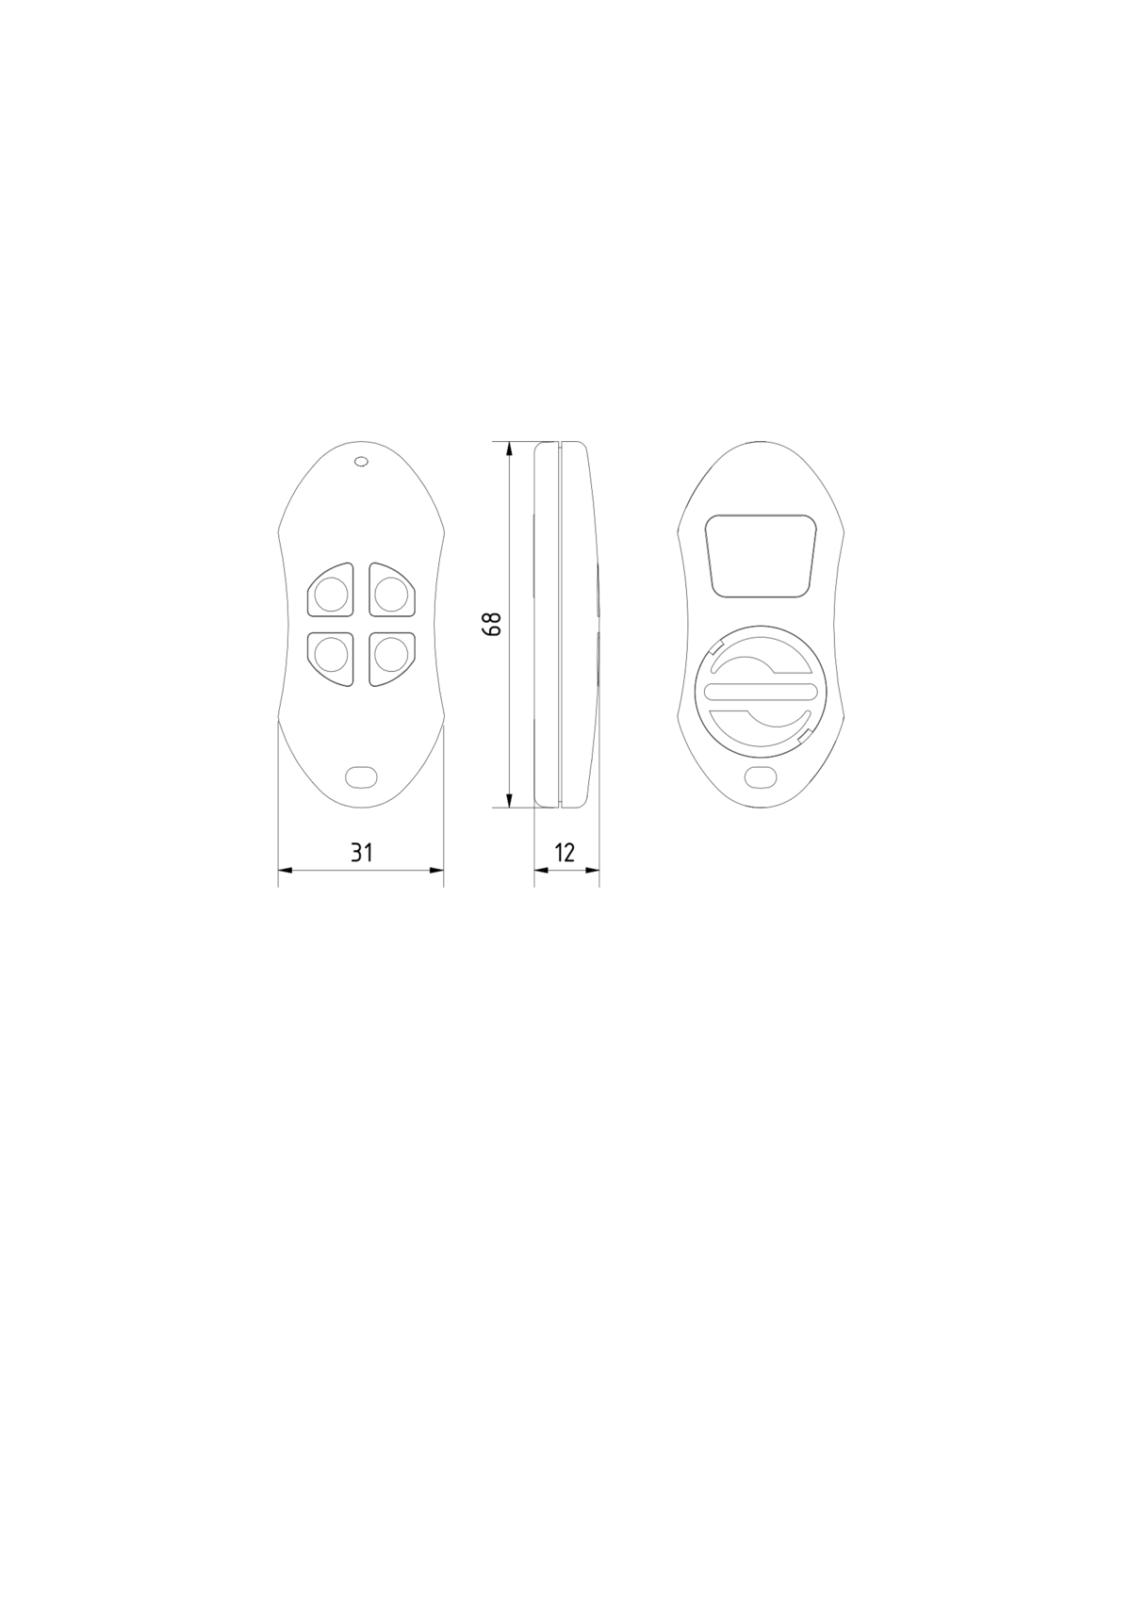 funksysteme_4kanalhandsendermicro-skizze